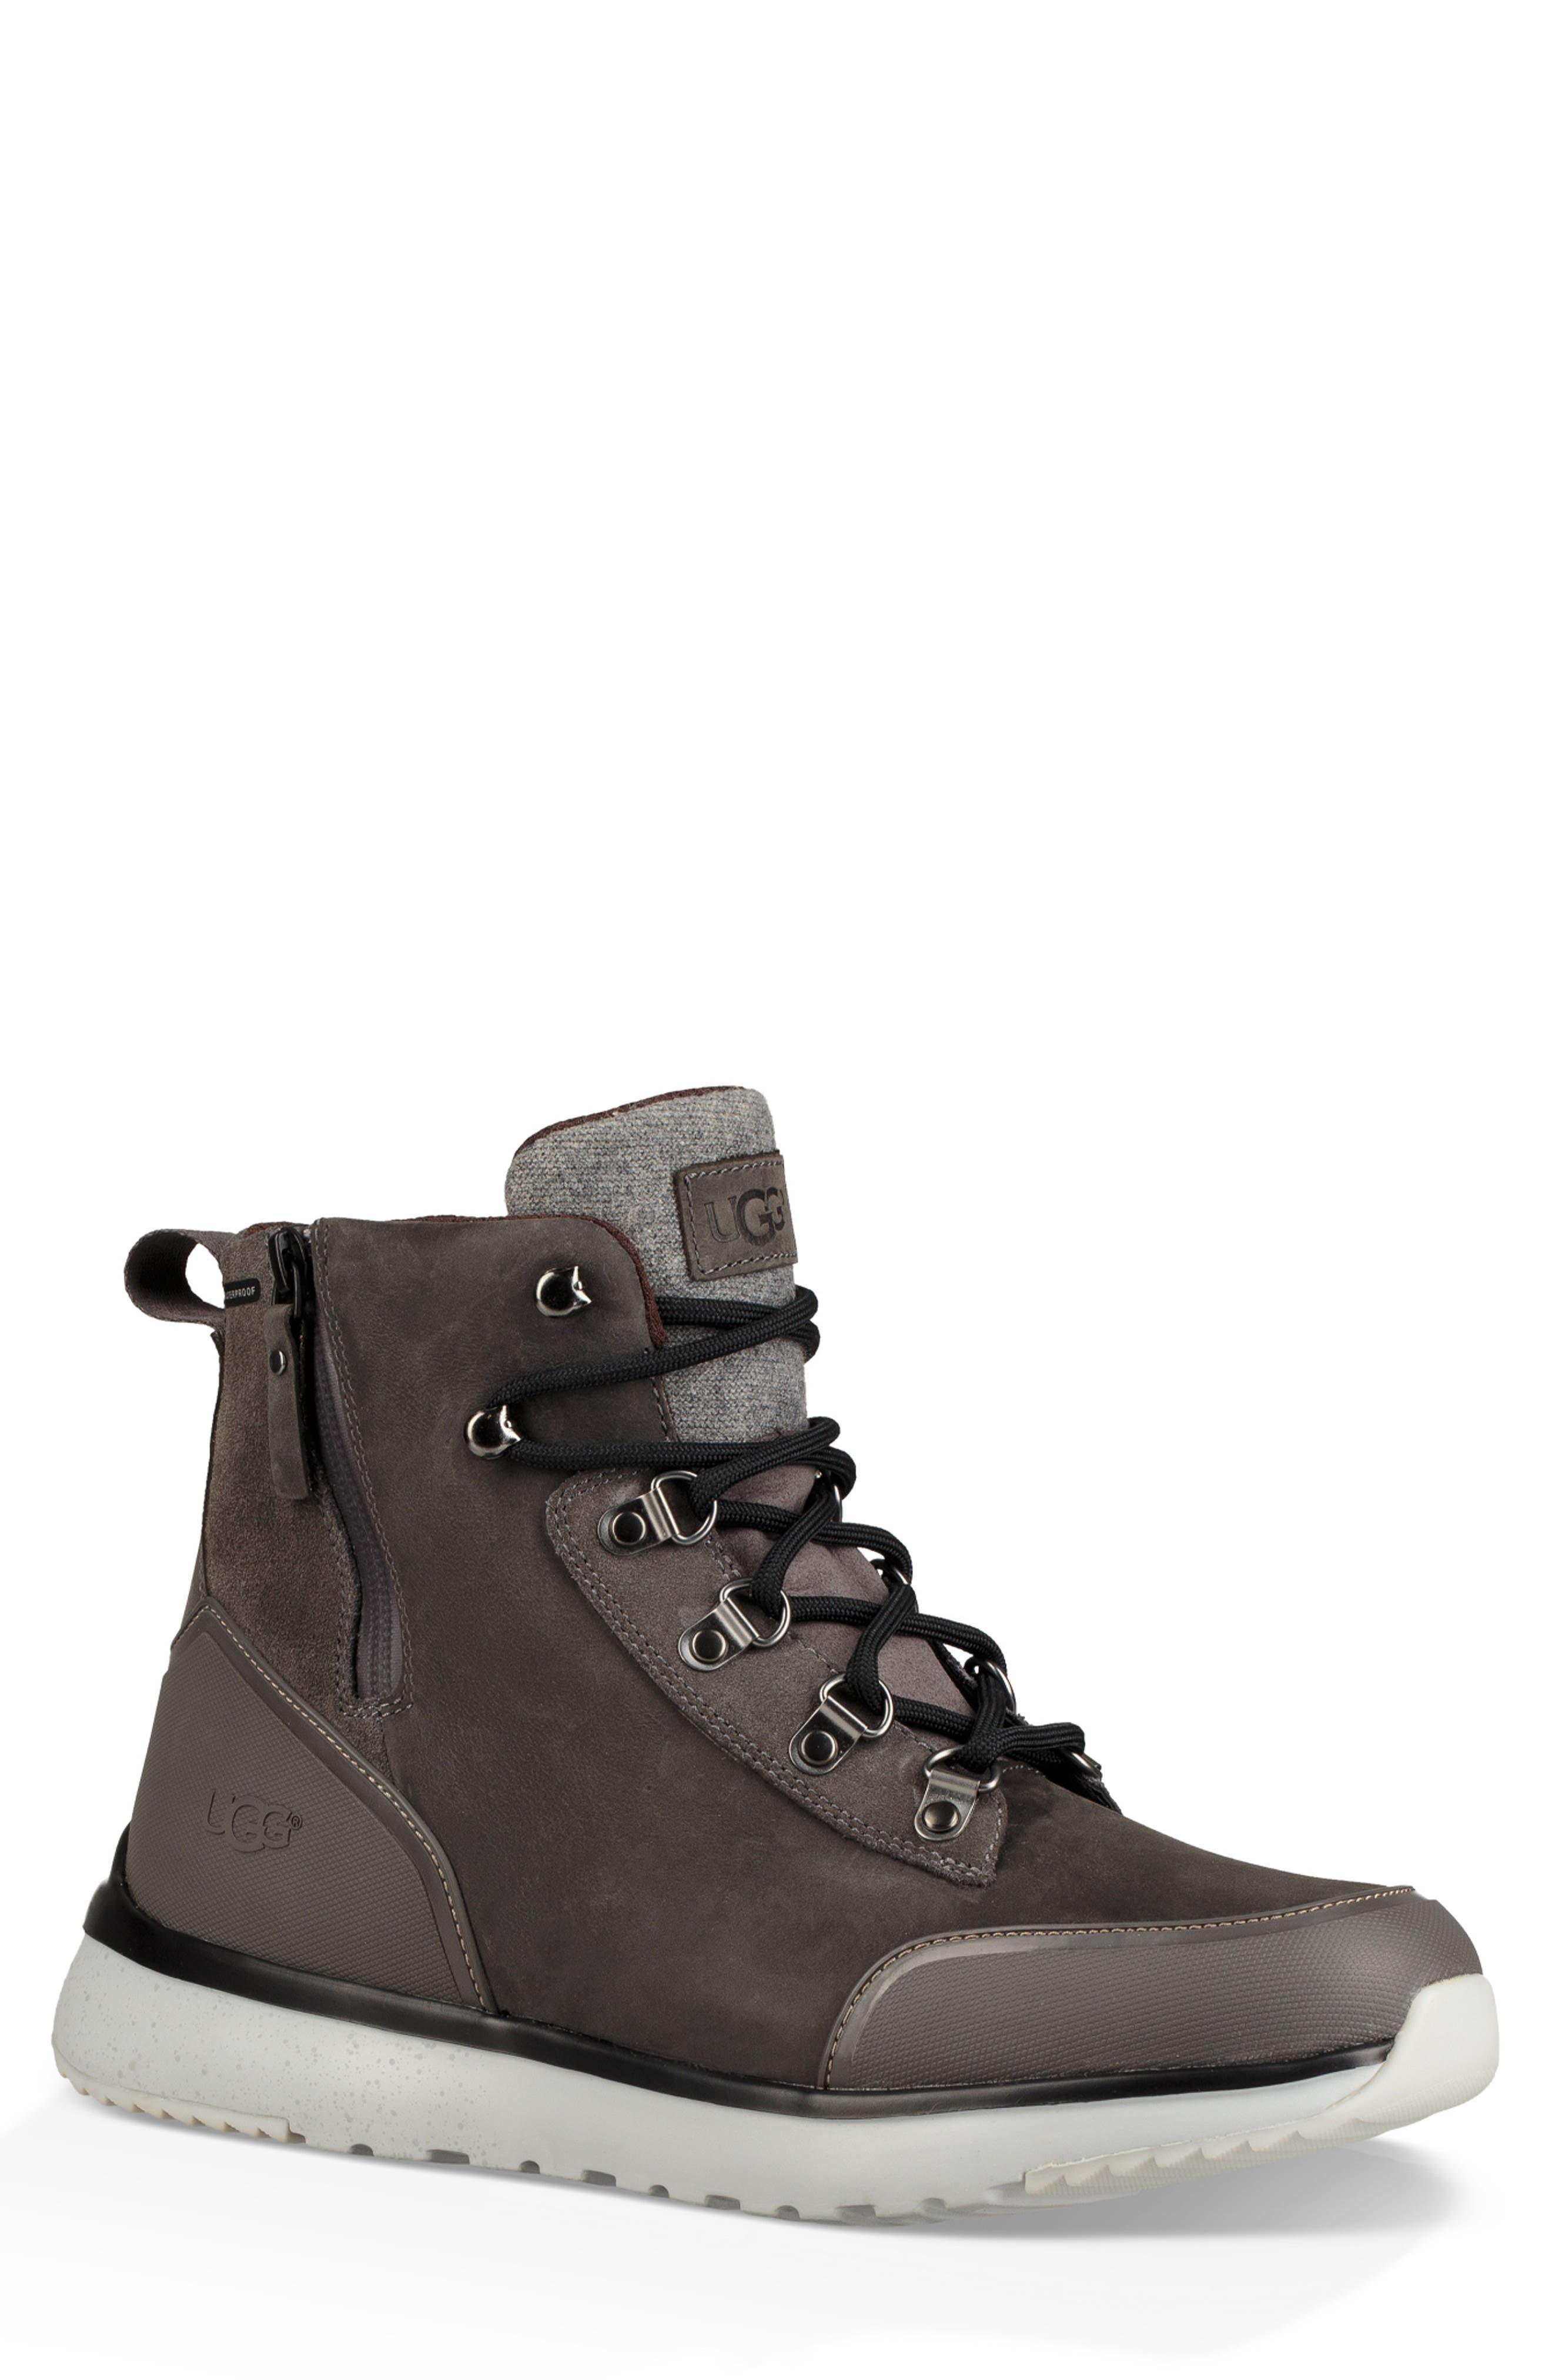 Ugg Caulder Waterproof Boot, Grey